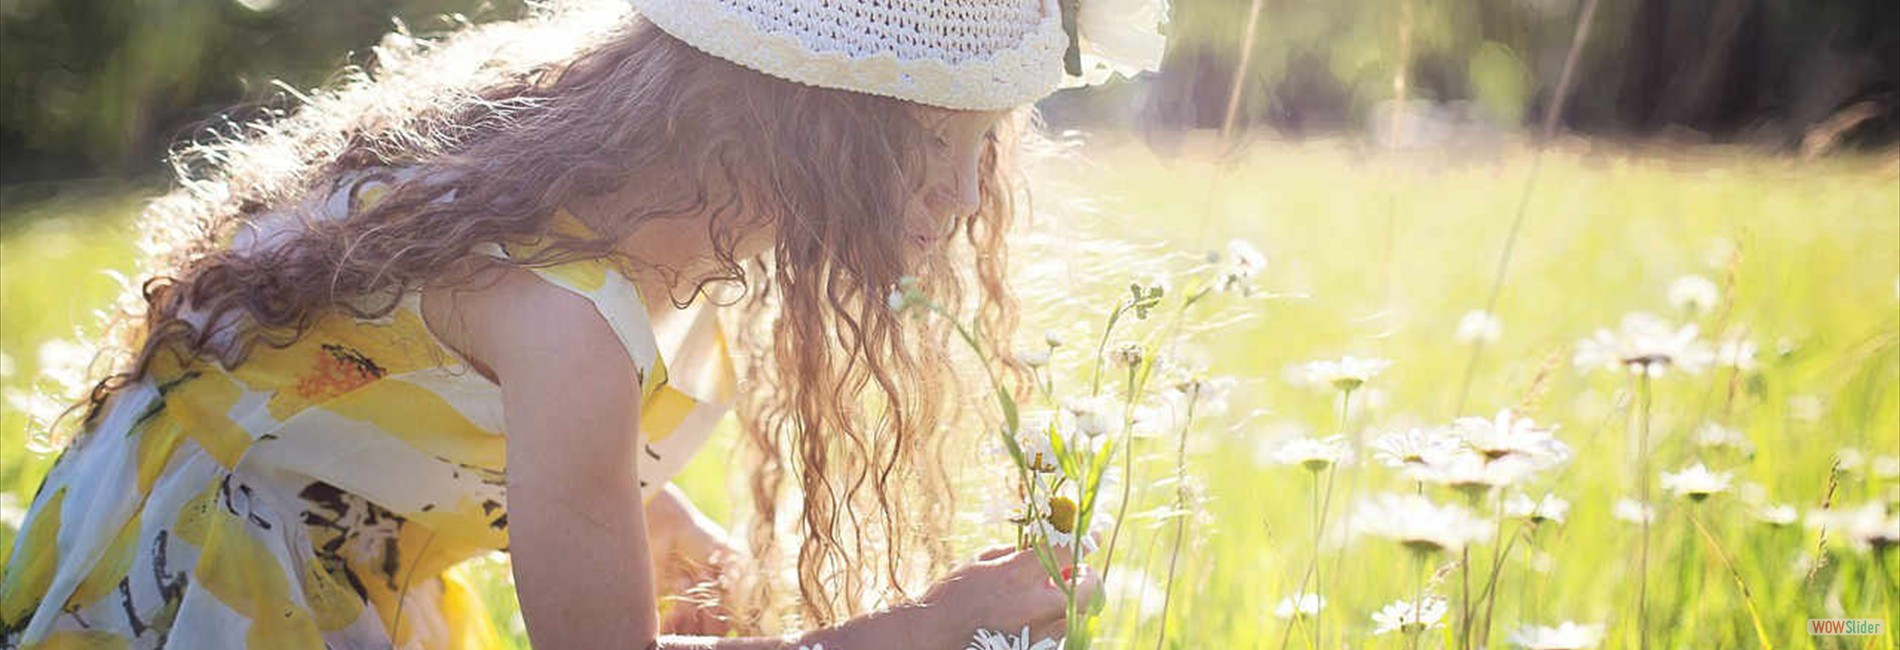 picking-flowers-2432972_1280